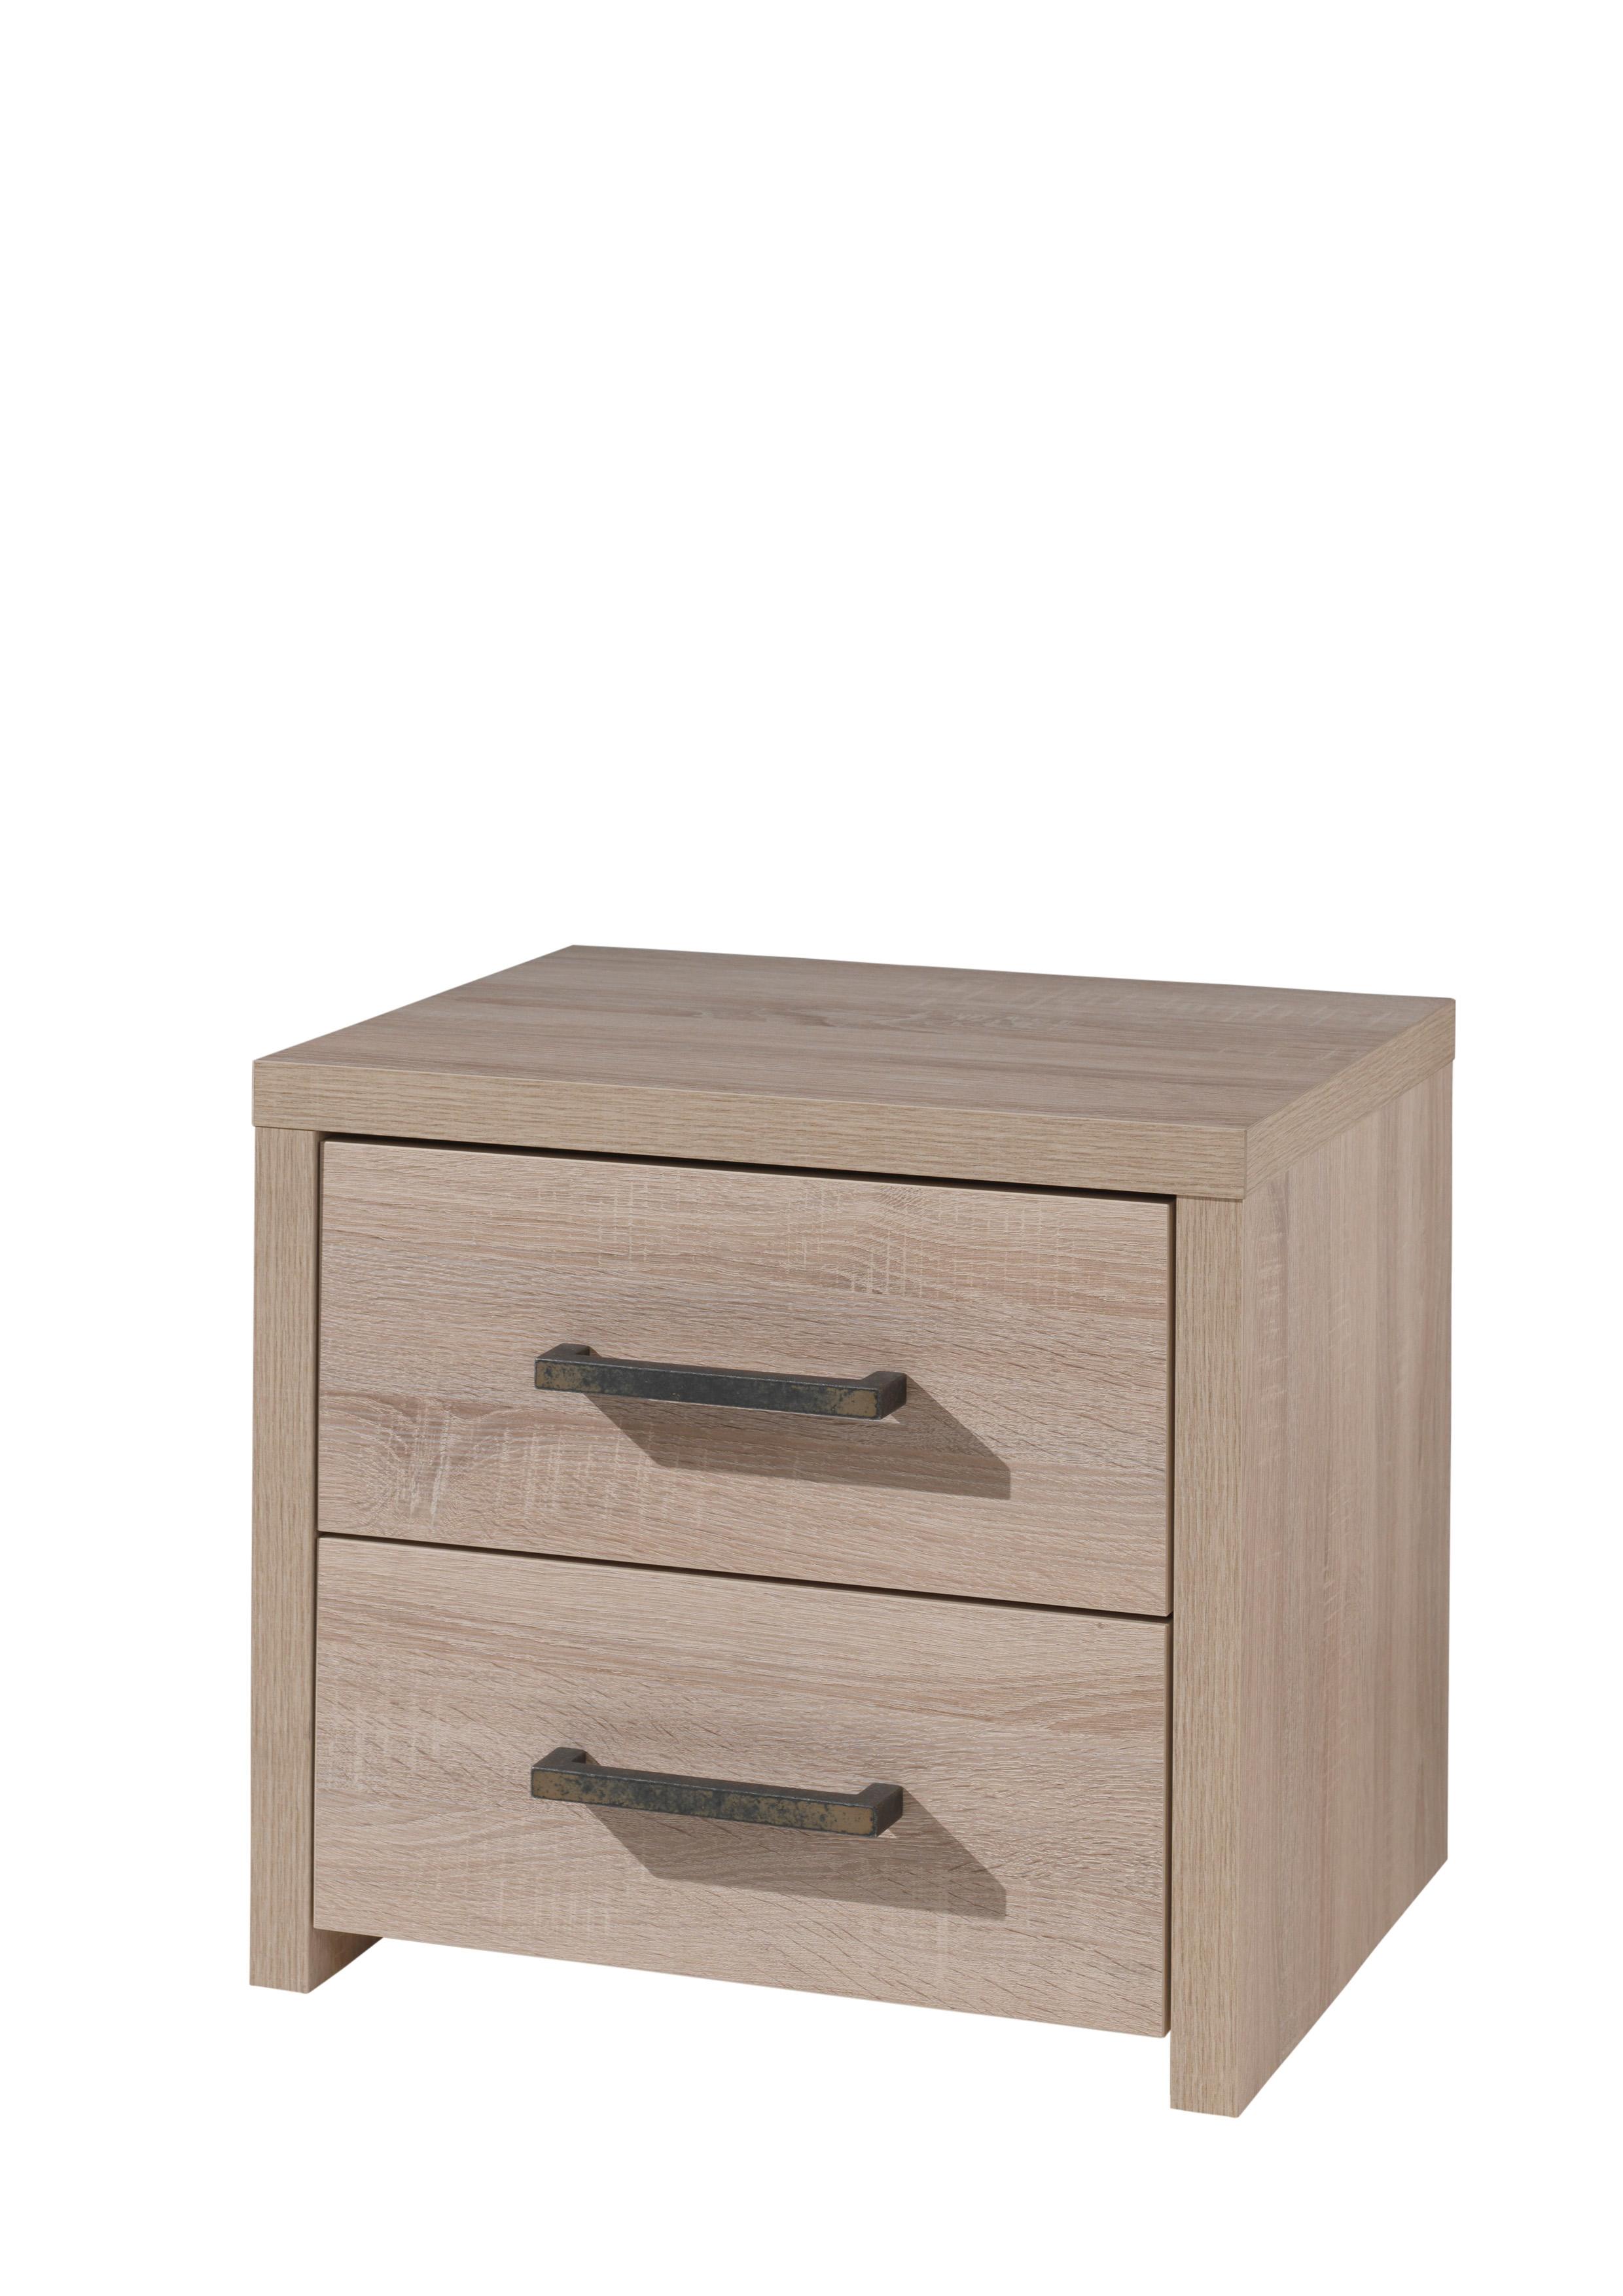 Noptiera din pal cu 2 sertare, pentru copii Aline Stejar deschis, l50xA40xH45,5 cm